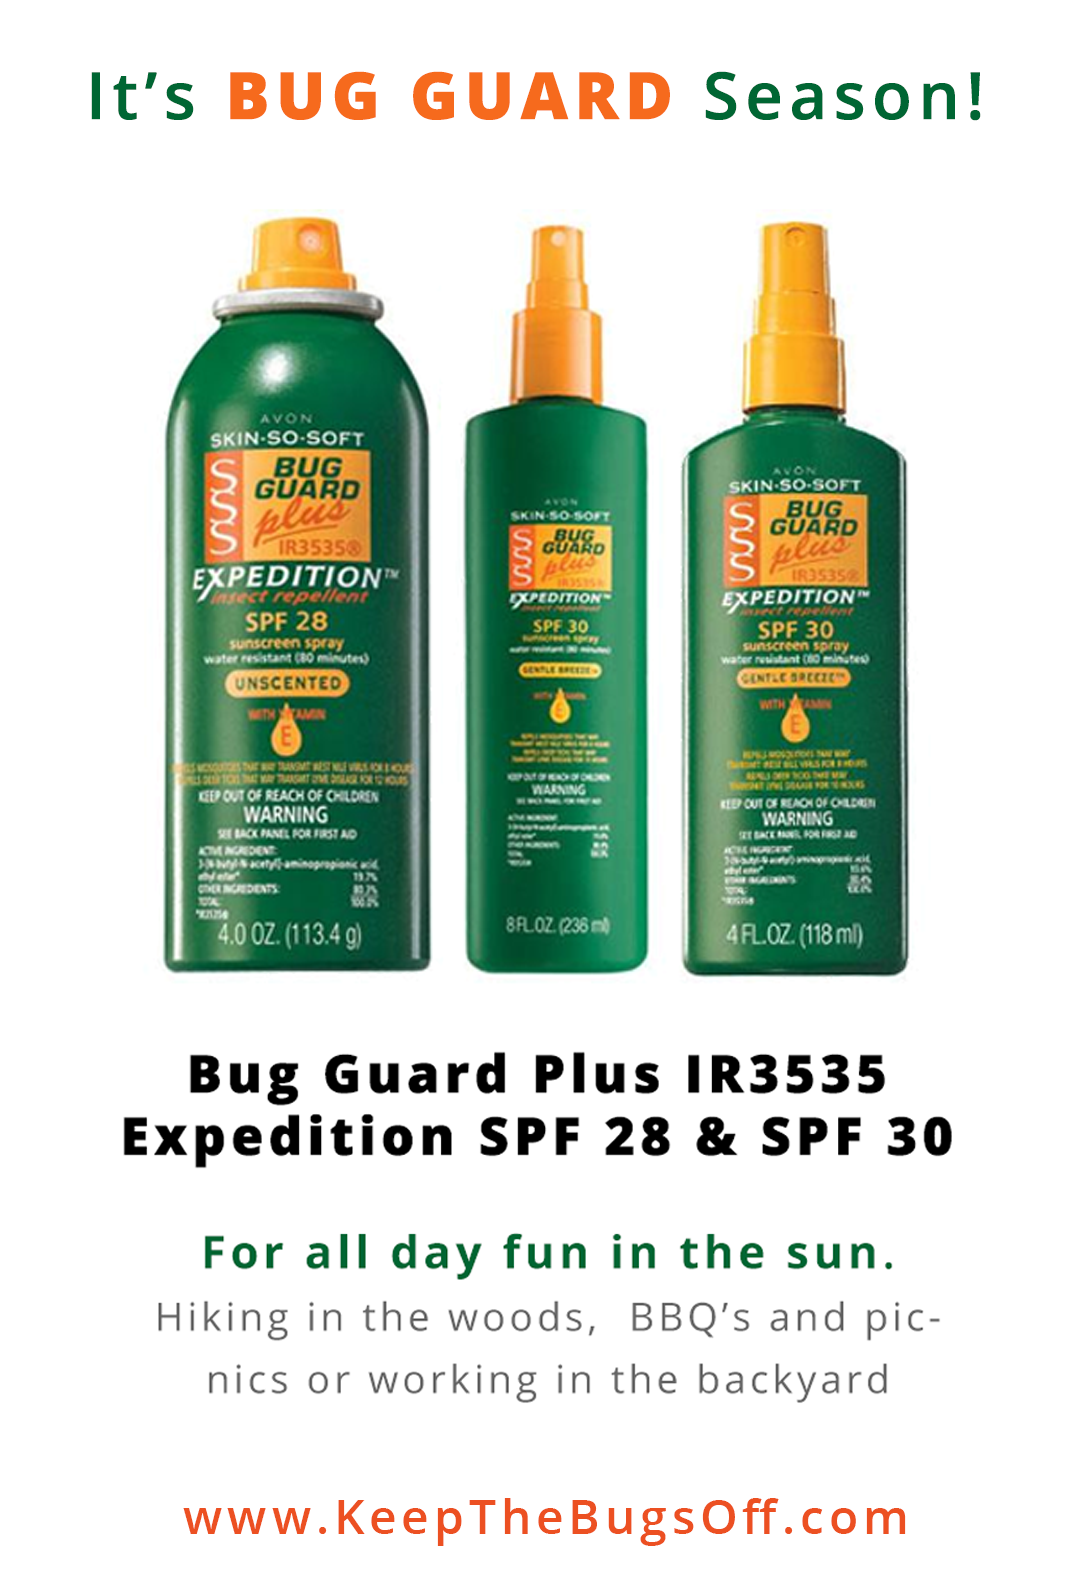 choosing your avon bug guard is easy use skin so soft bug guard